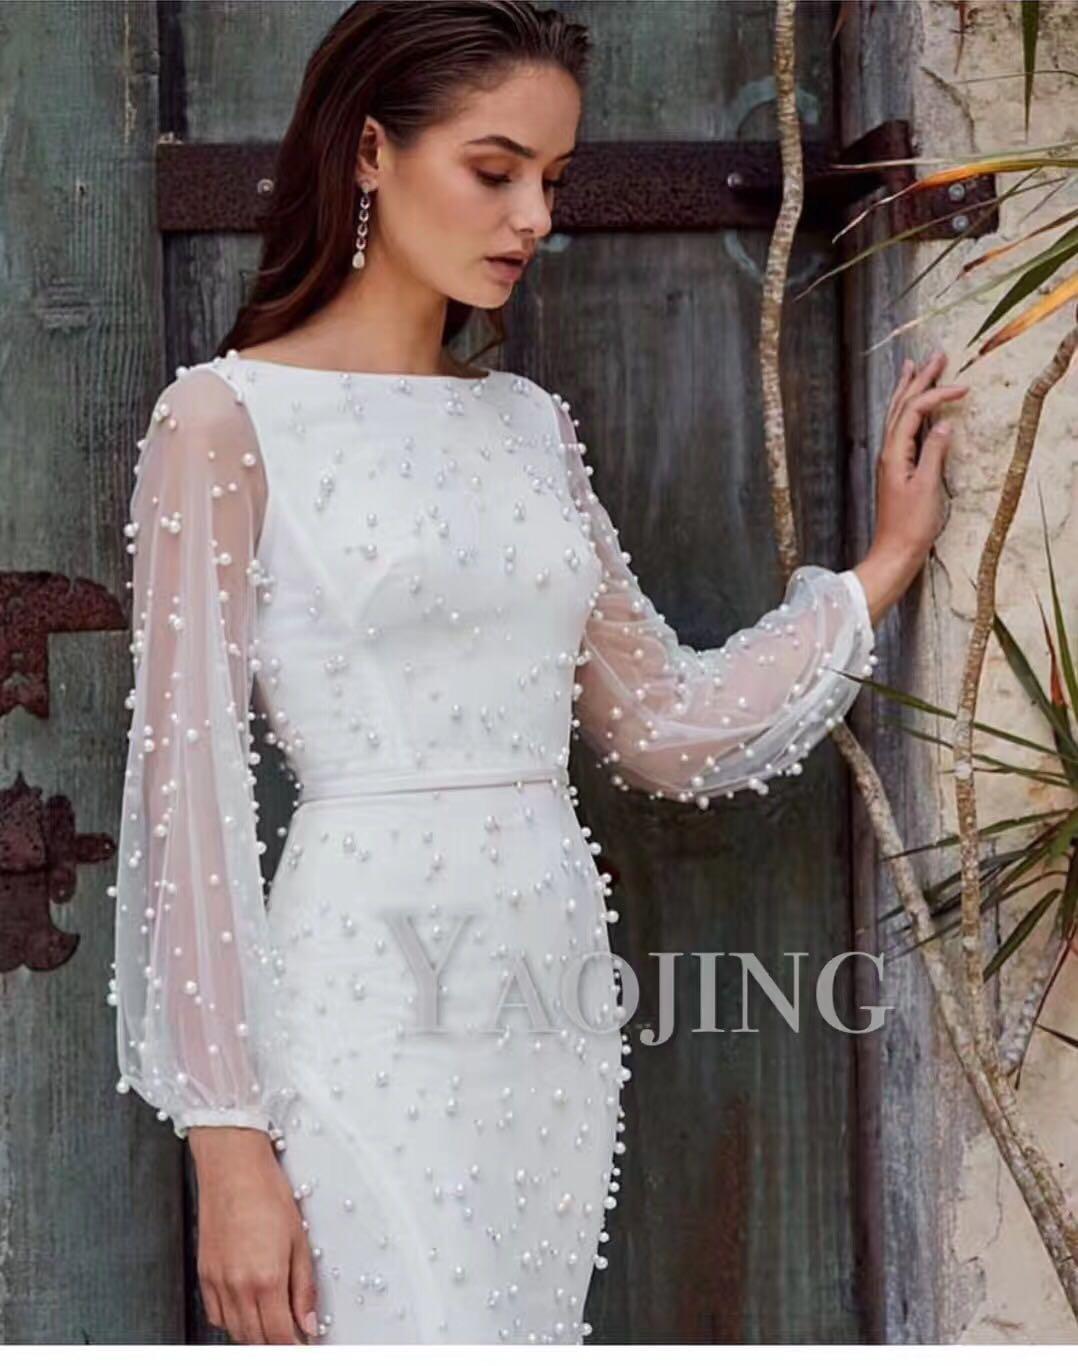 2020 European design fashion women's new gauze patchwork long sleeve beading slim waist pencil knee length dress plus size SML